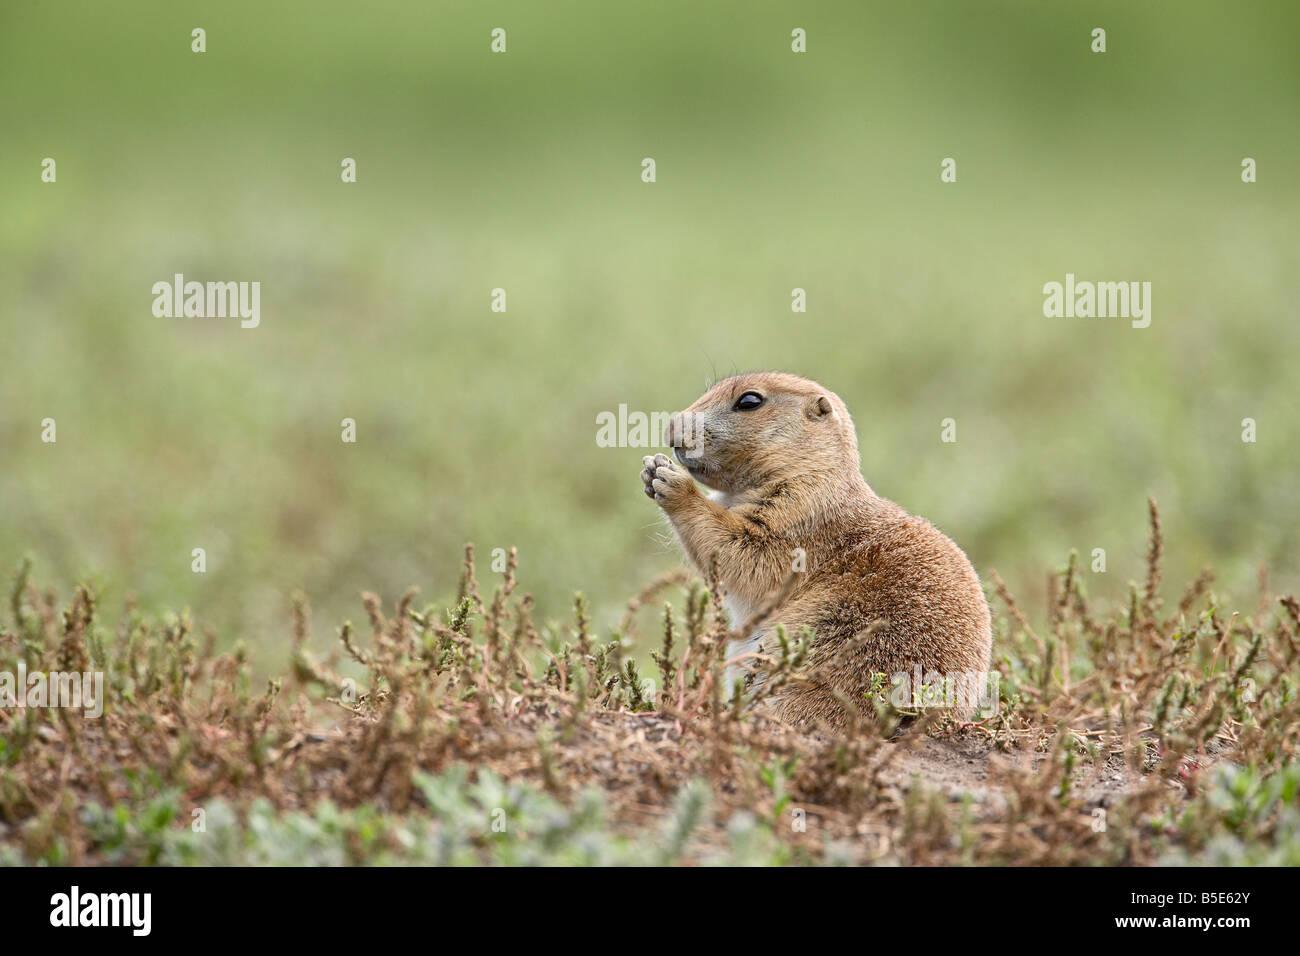 Baby blacktail prairie dog (Cynomys ludovicianus), Custer State Park, South Dakota, USA, North America - Stock Image